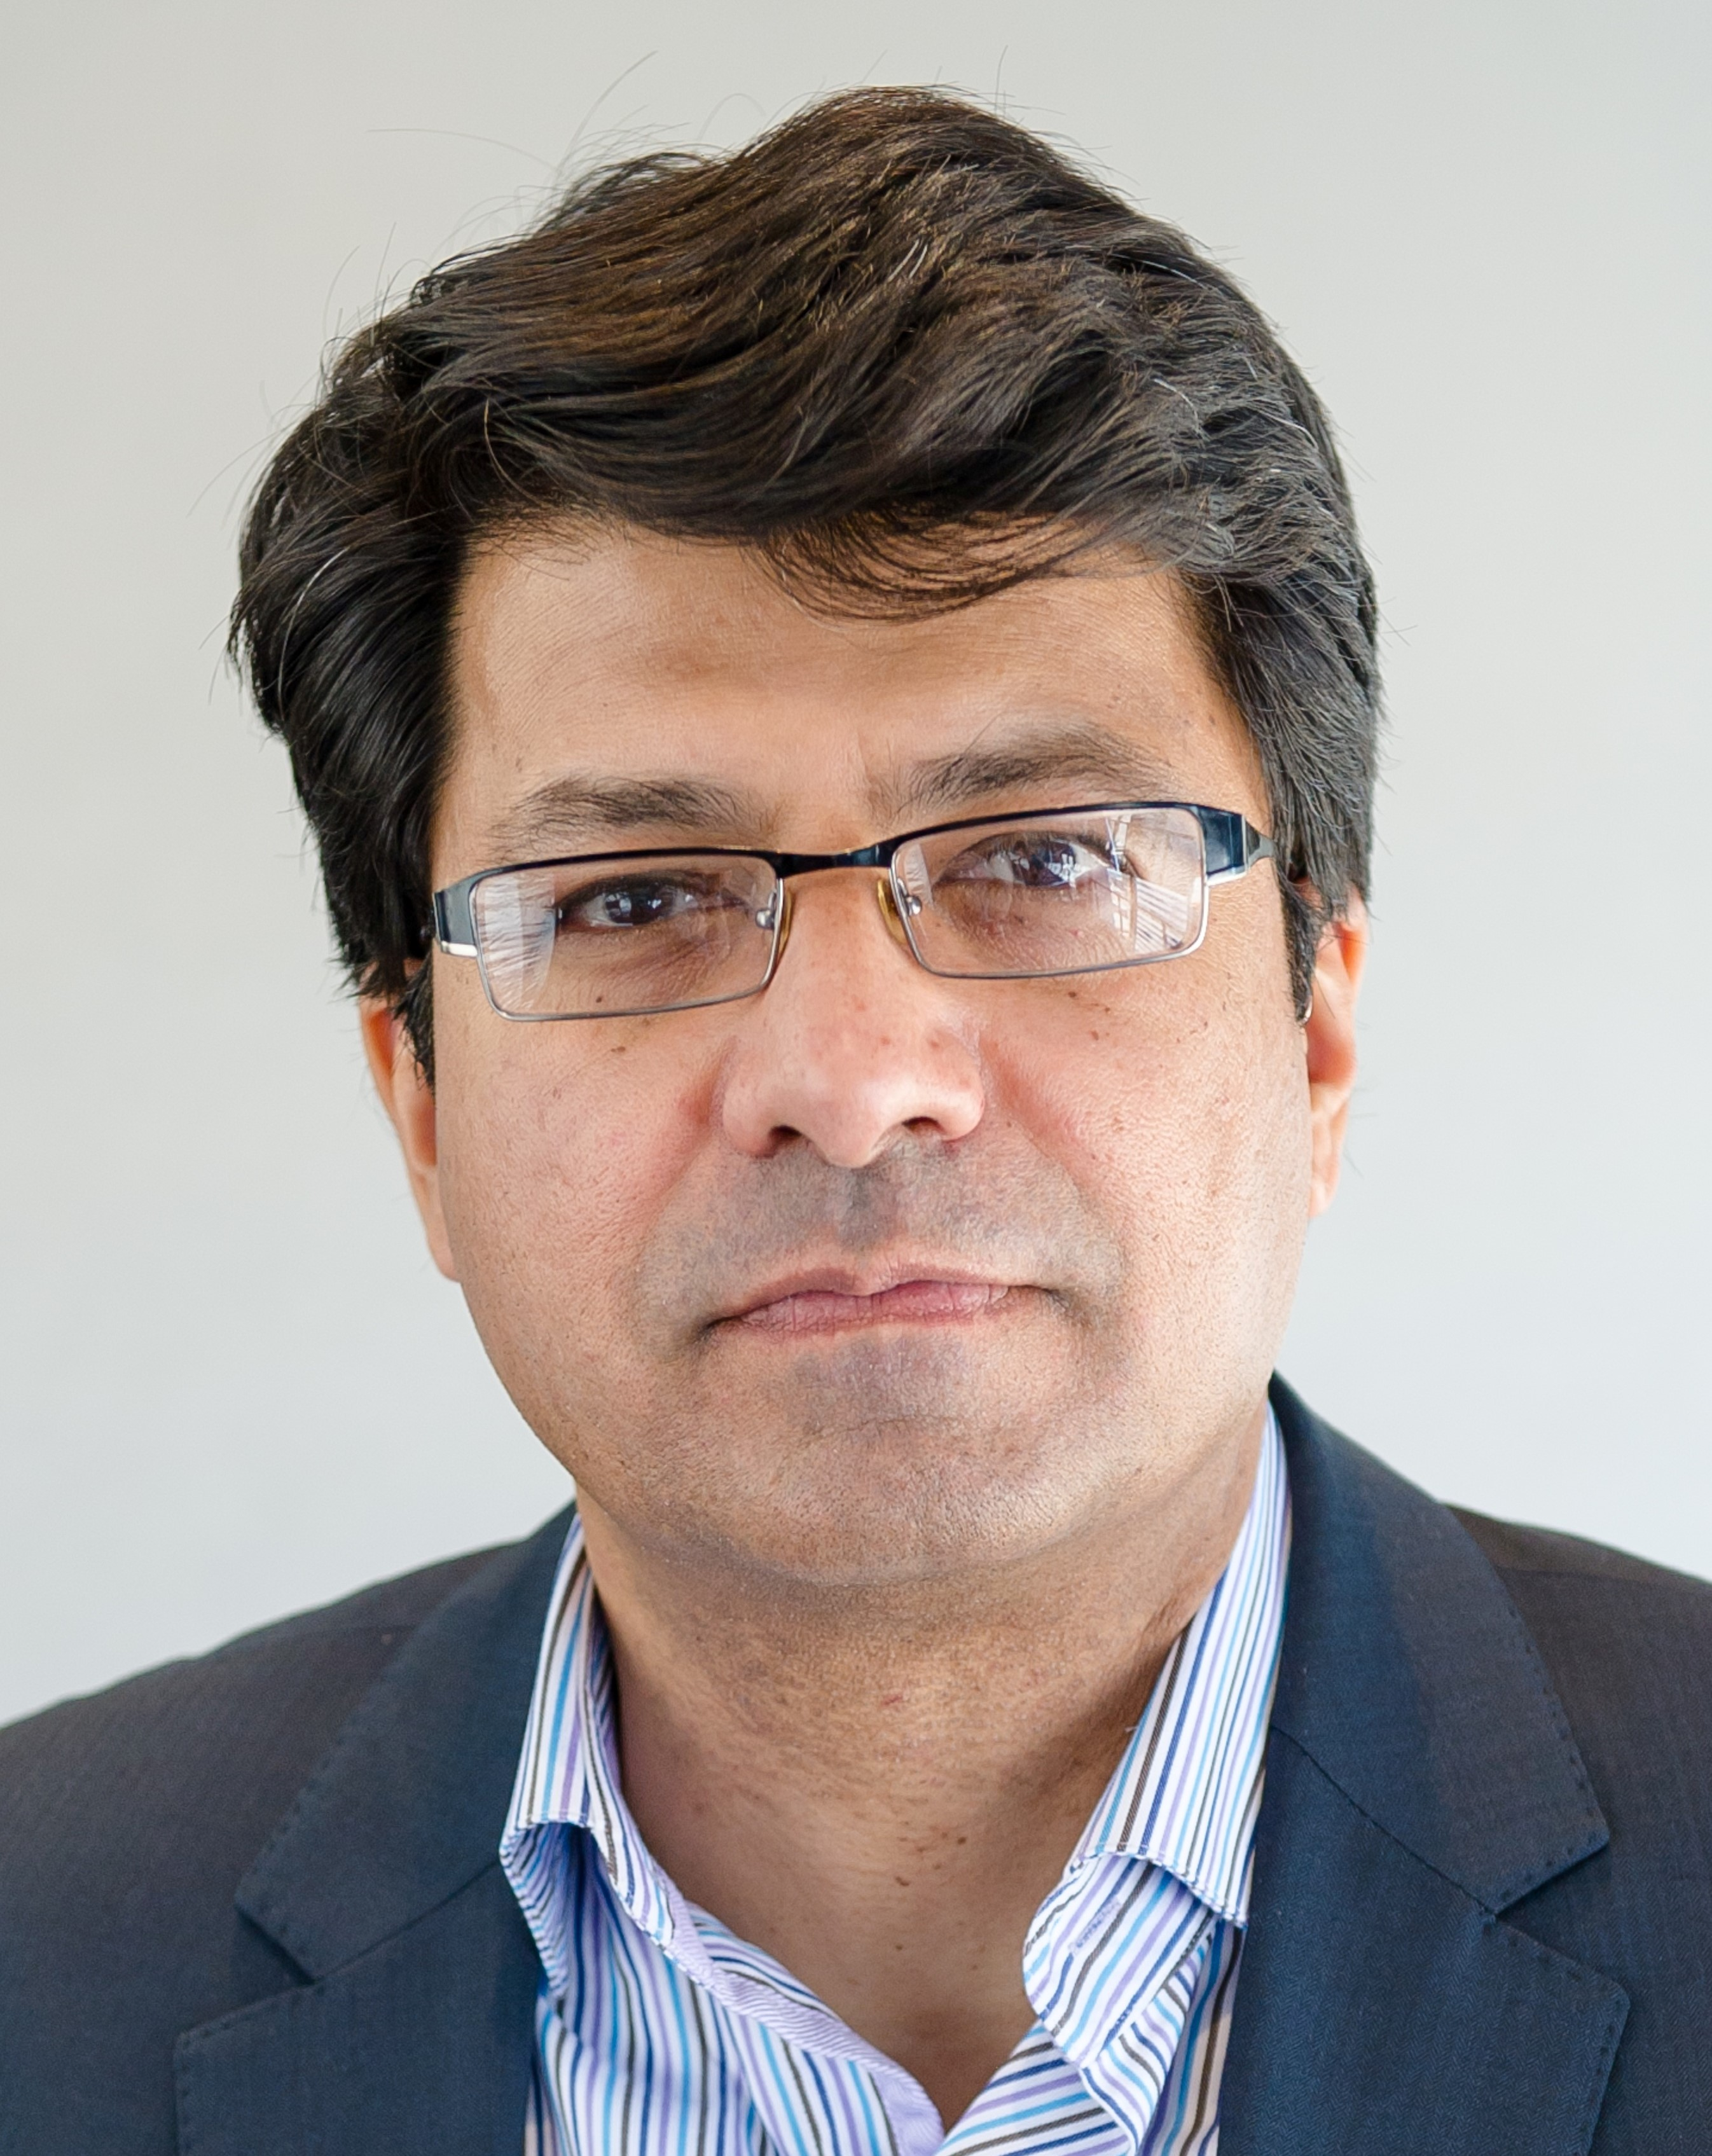 Tariq Samad